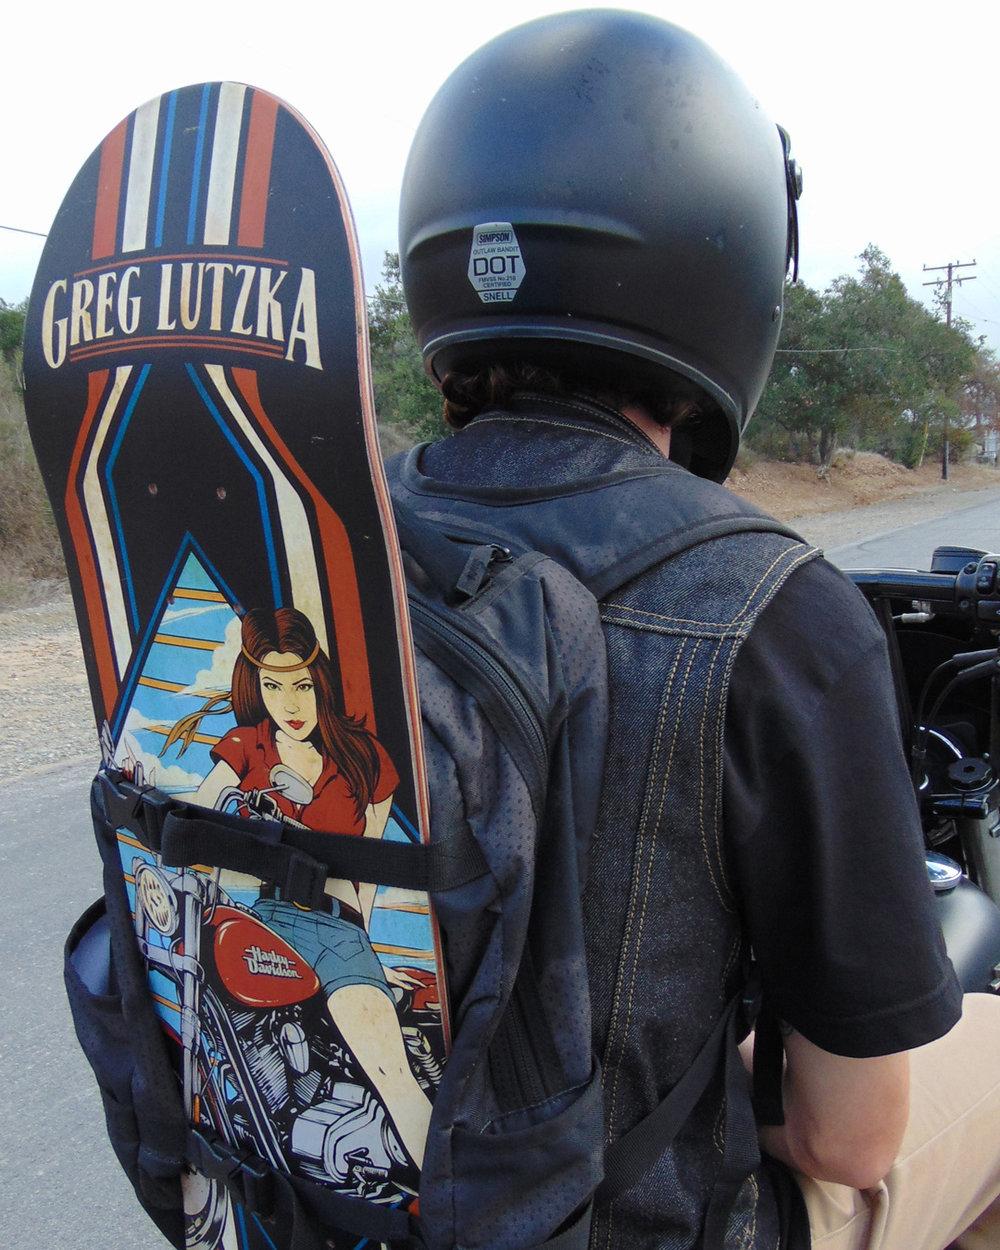 Darkstar-skateboards-greg-lutzka-harley-davidson-S2.jpg